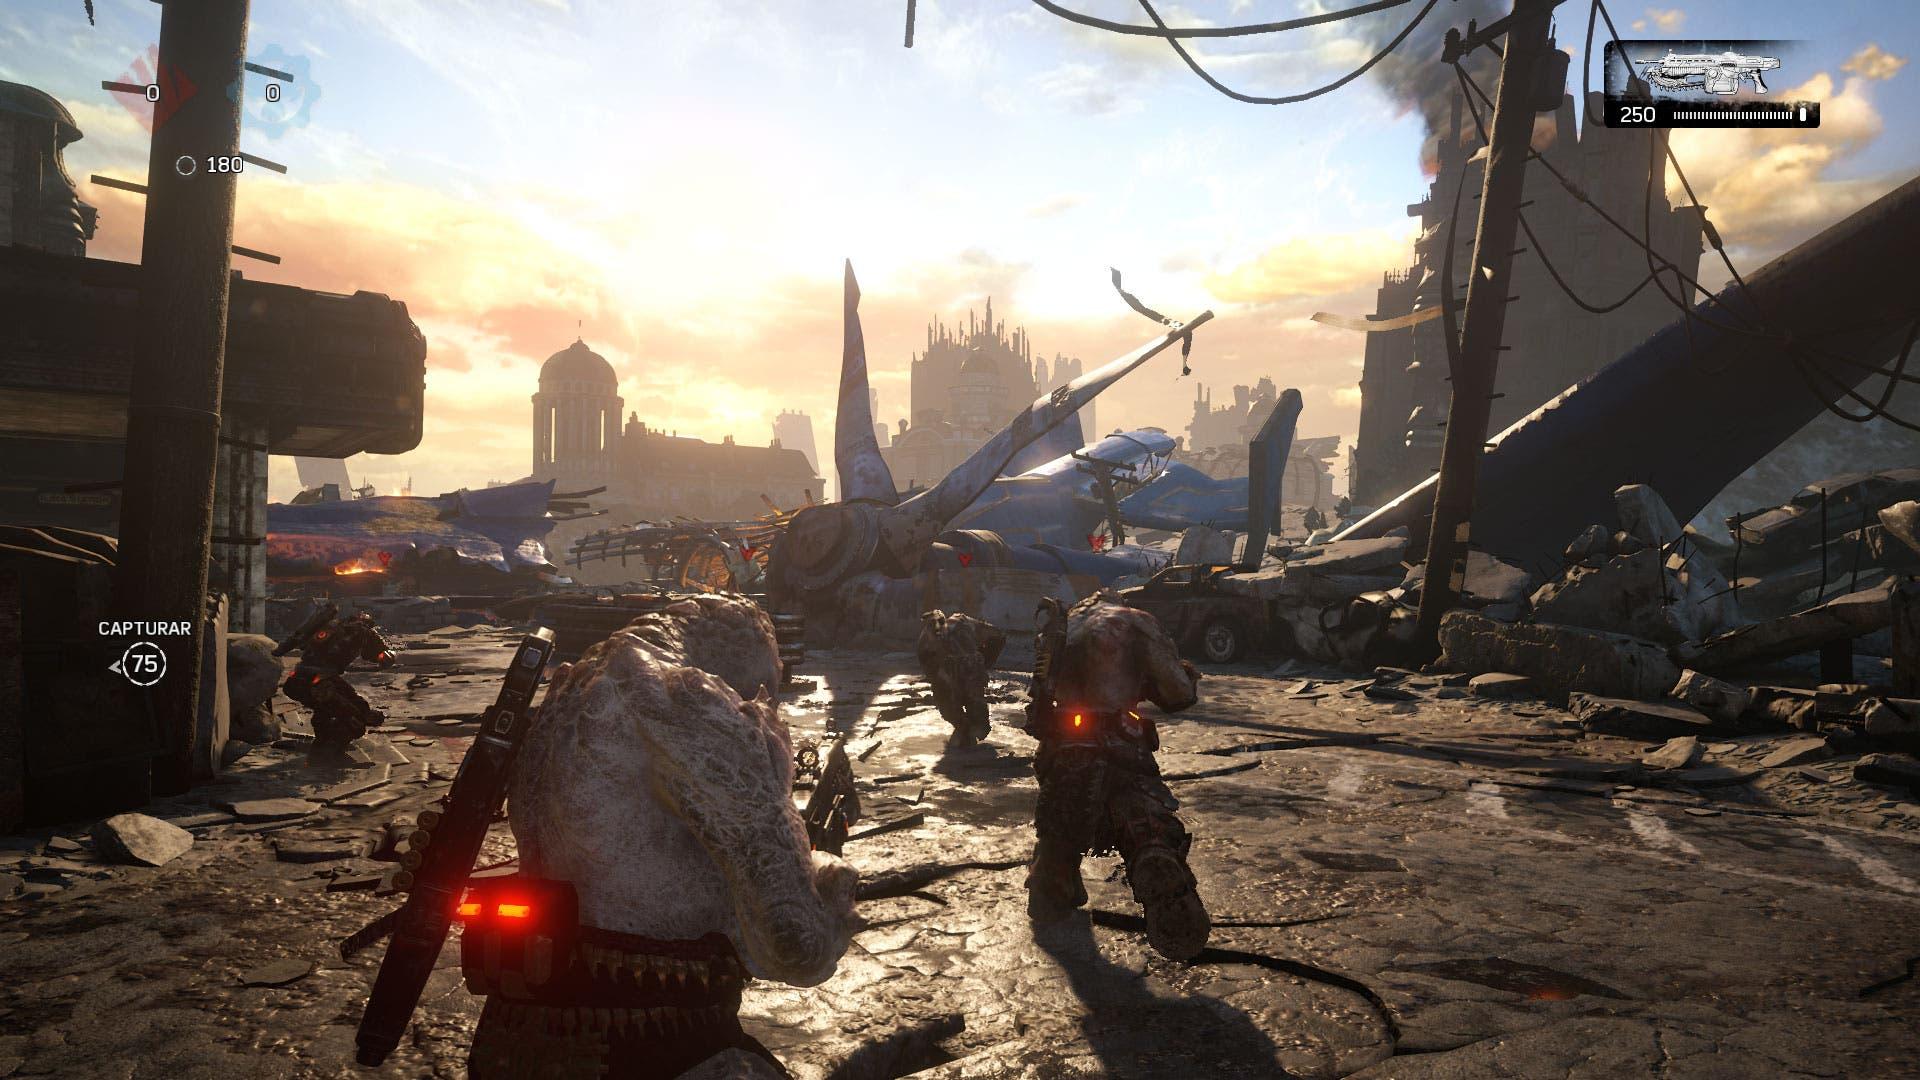 Análisis de Gears of War 4